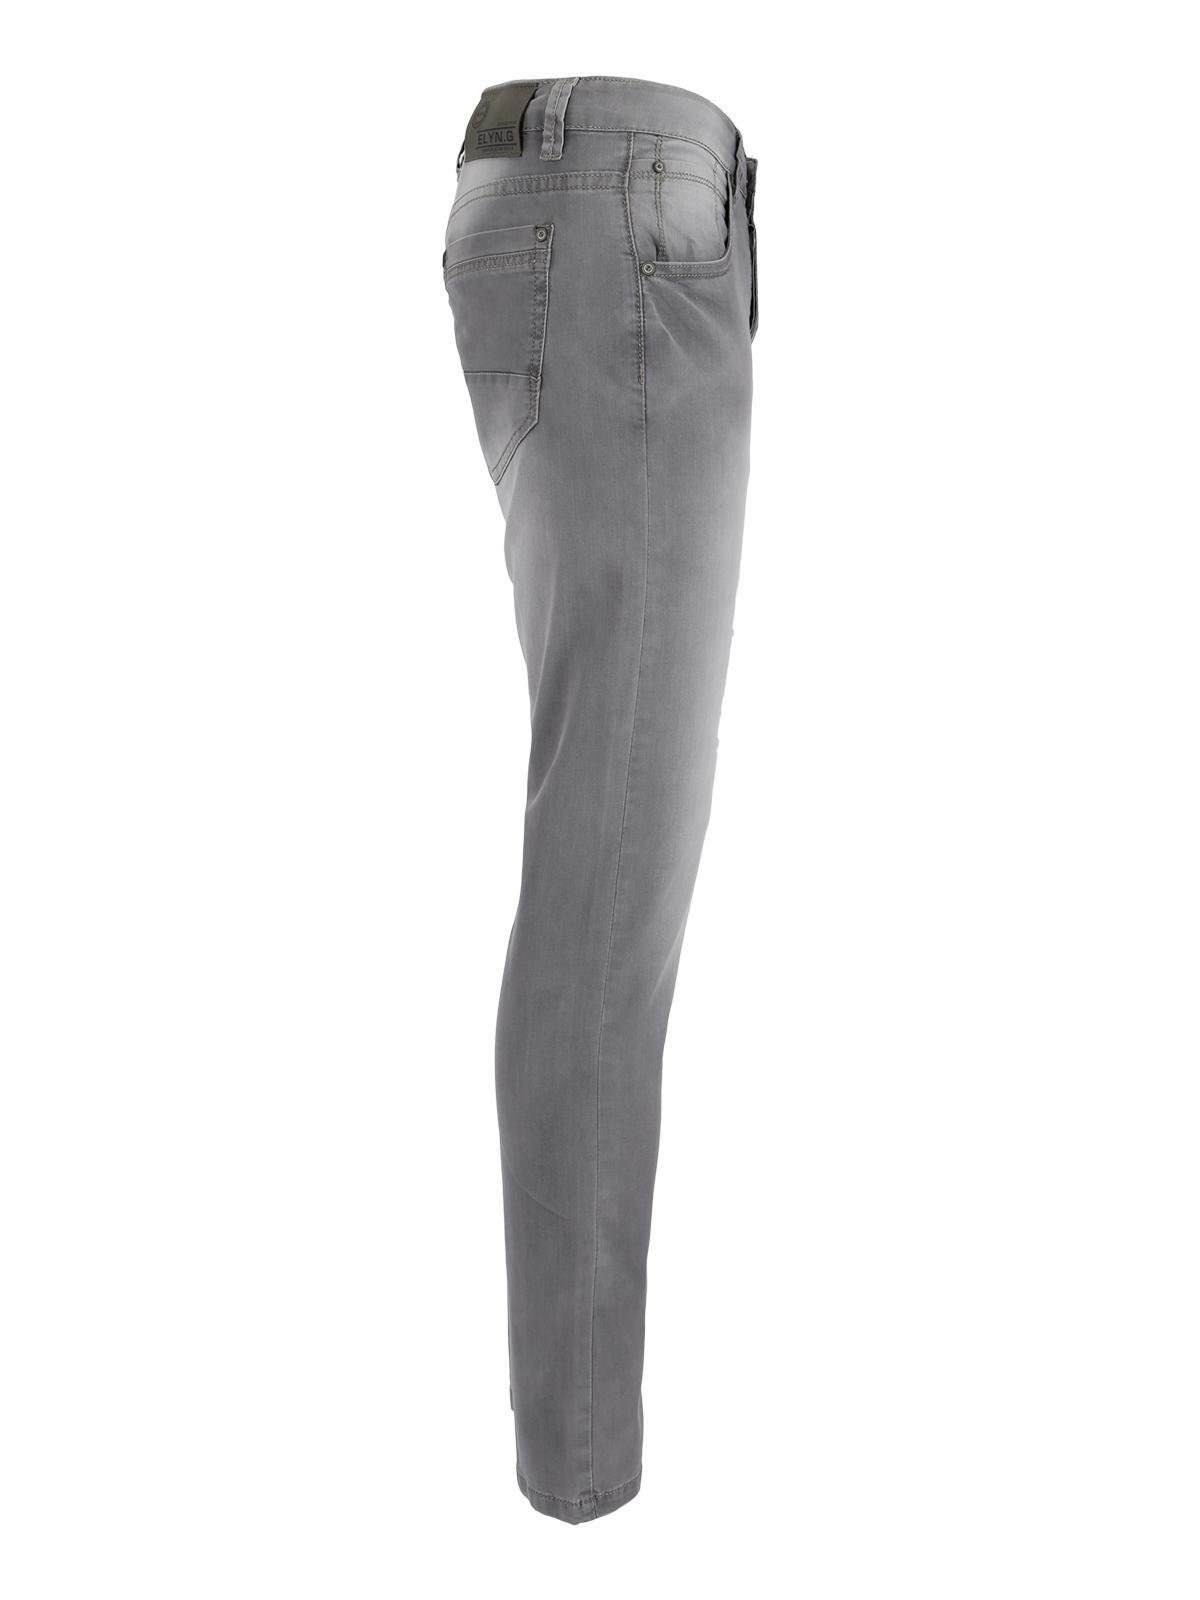 Pantalones Vaqueros Elasticos Ajuste Estrecho Hombre Mecshopping